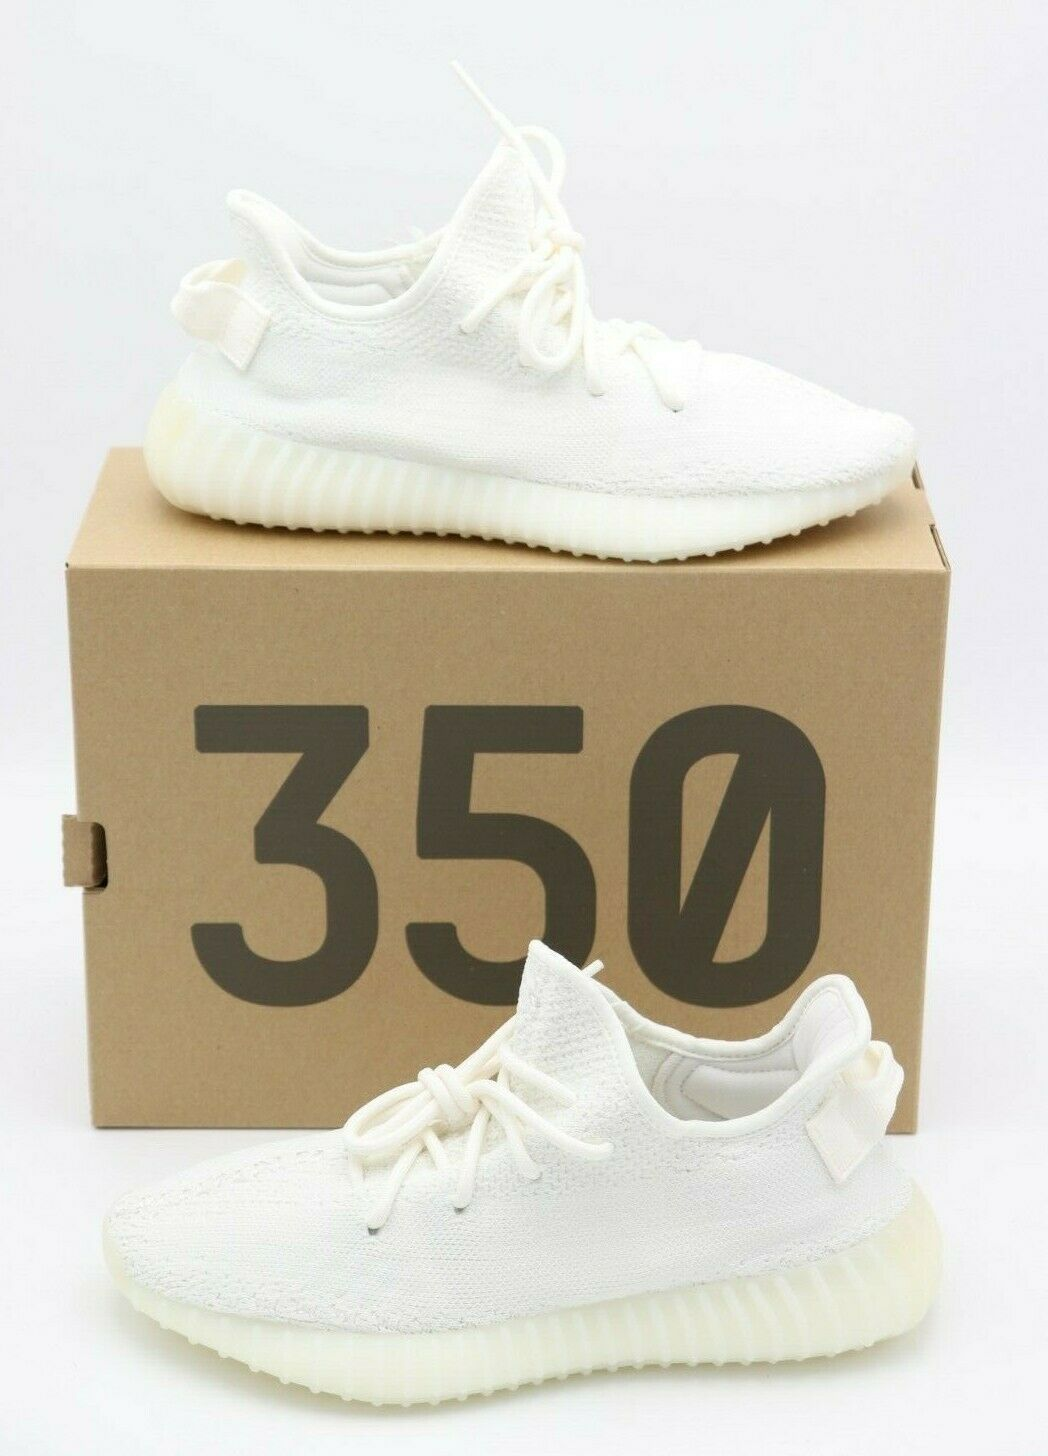 Neu in Box Adidas Yeezy Boost 350 V2 Triple Weiß Neu Größe 8